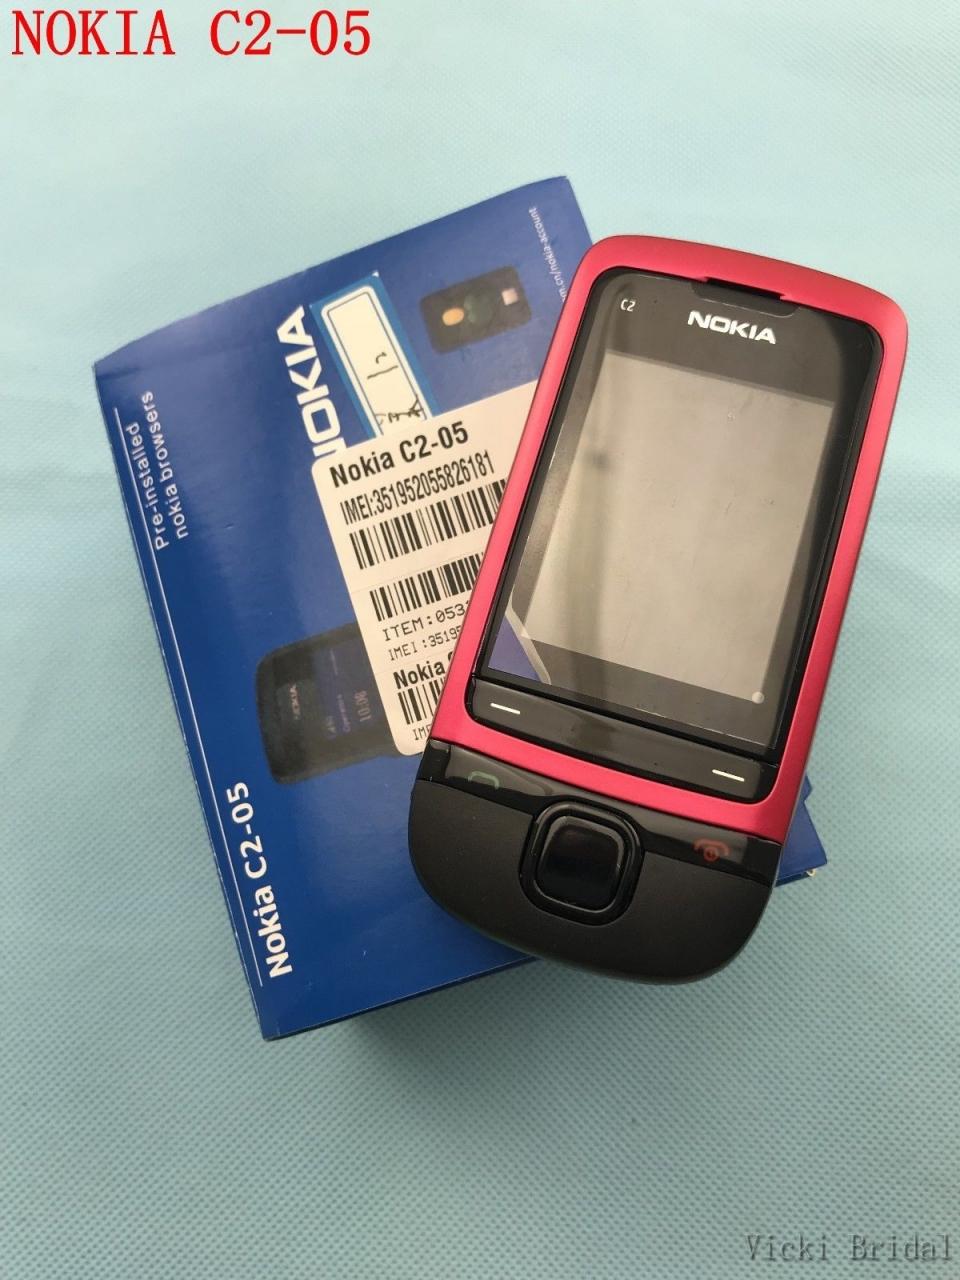 Refurbished phone Original Unlocked Nokia C2-05 slide cell phone Bluetooth phone black 2